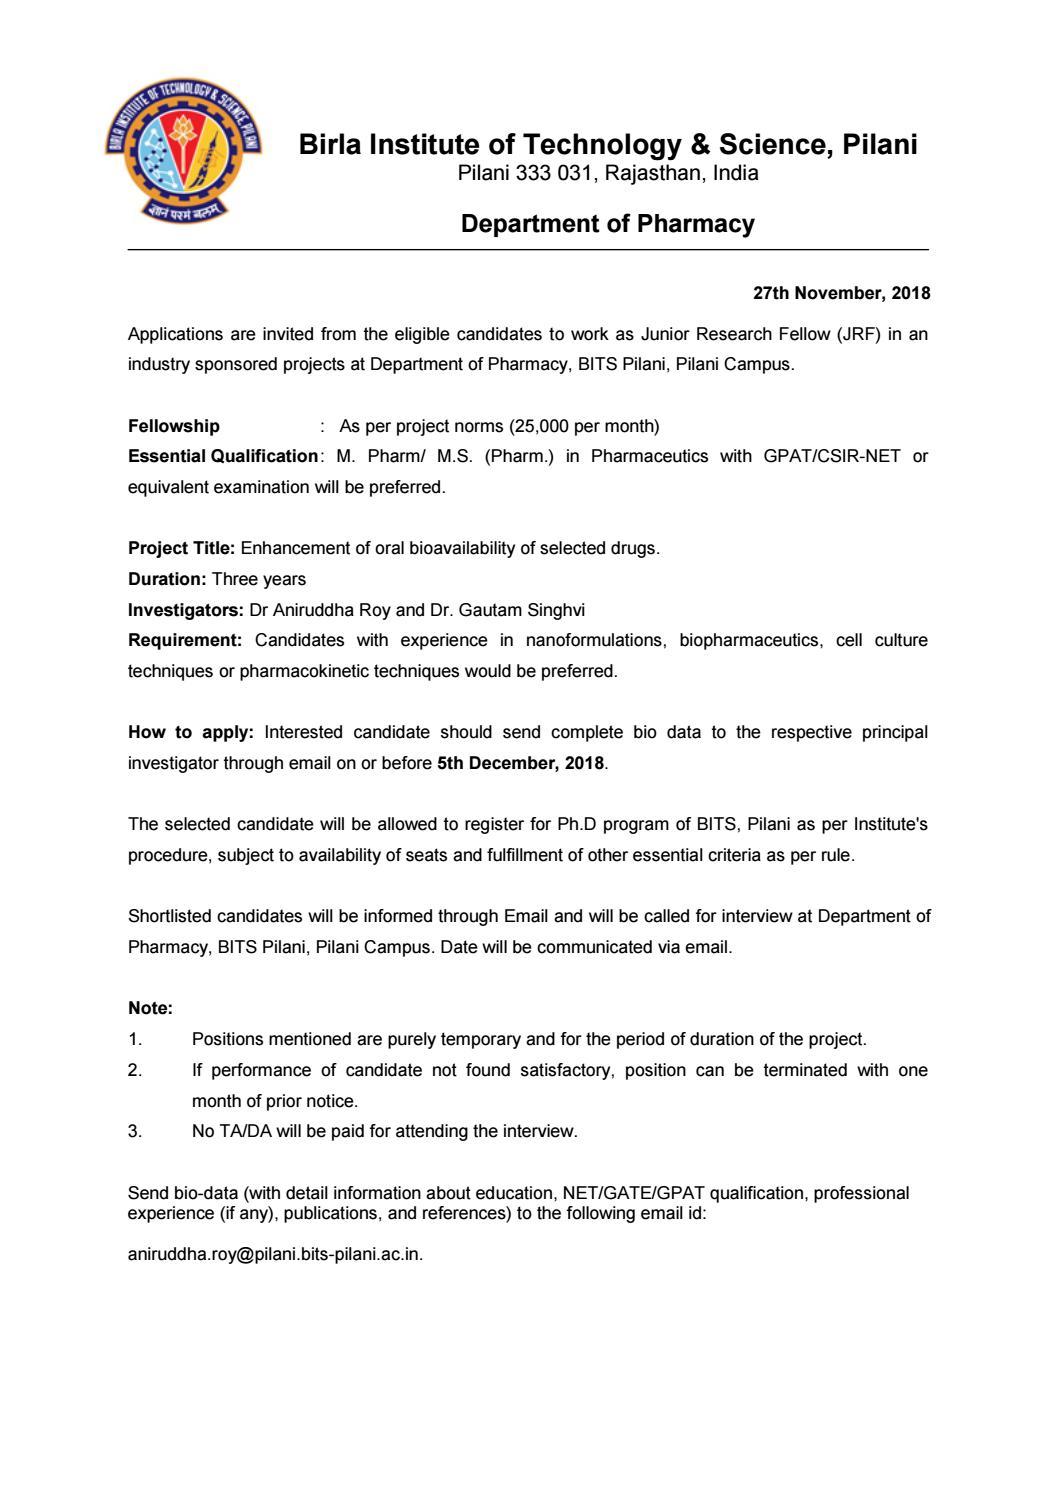 Pharma Jobs @ BITS PILANI, Chemistry Research Fellow Job Opening by